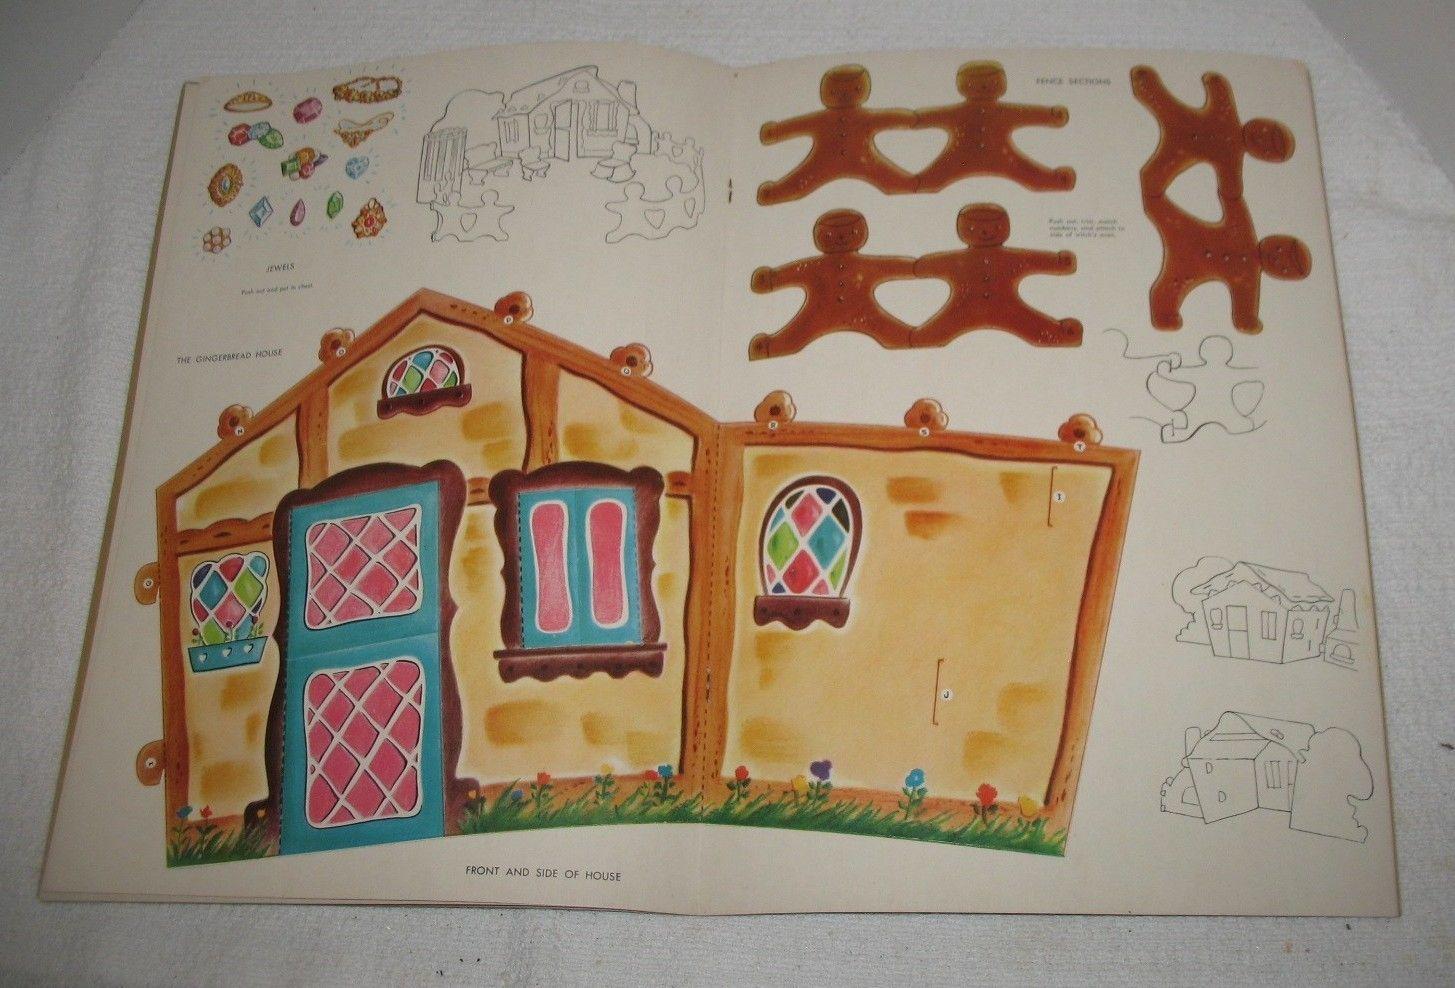 Vtg Unused Uncut 1967 Whitman Hansel Gretel w House Punch Push Out Paper Dolls | eBay